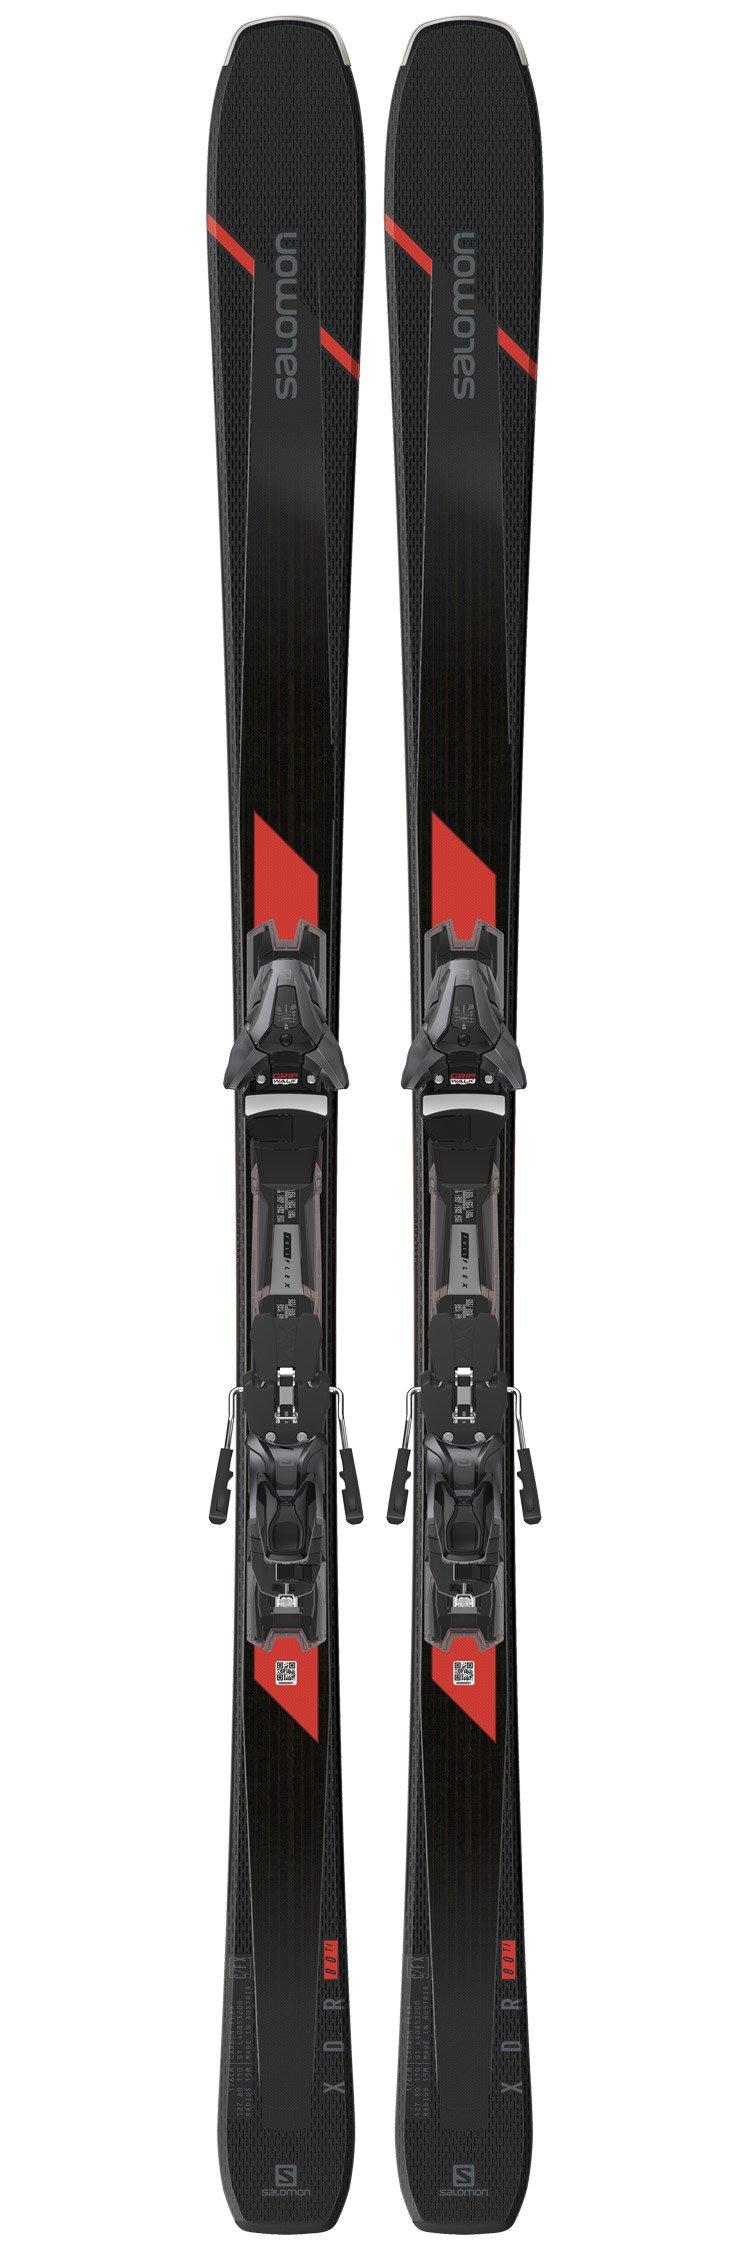 Salomon XDR 80 Ti+Z12 GW F80